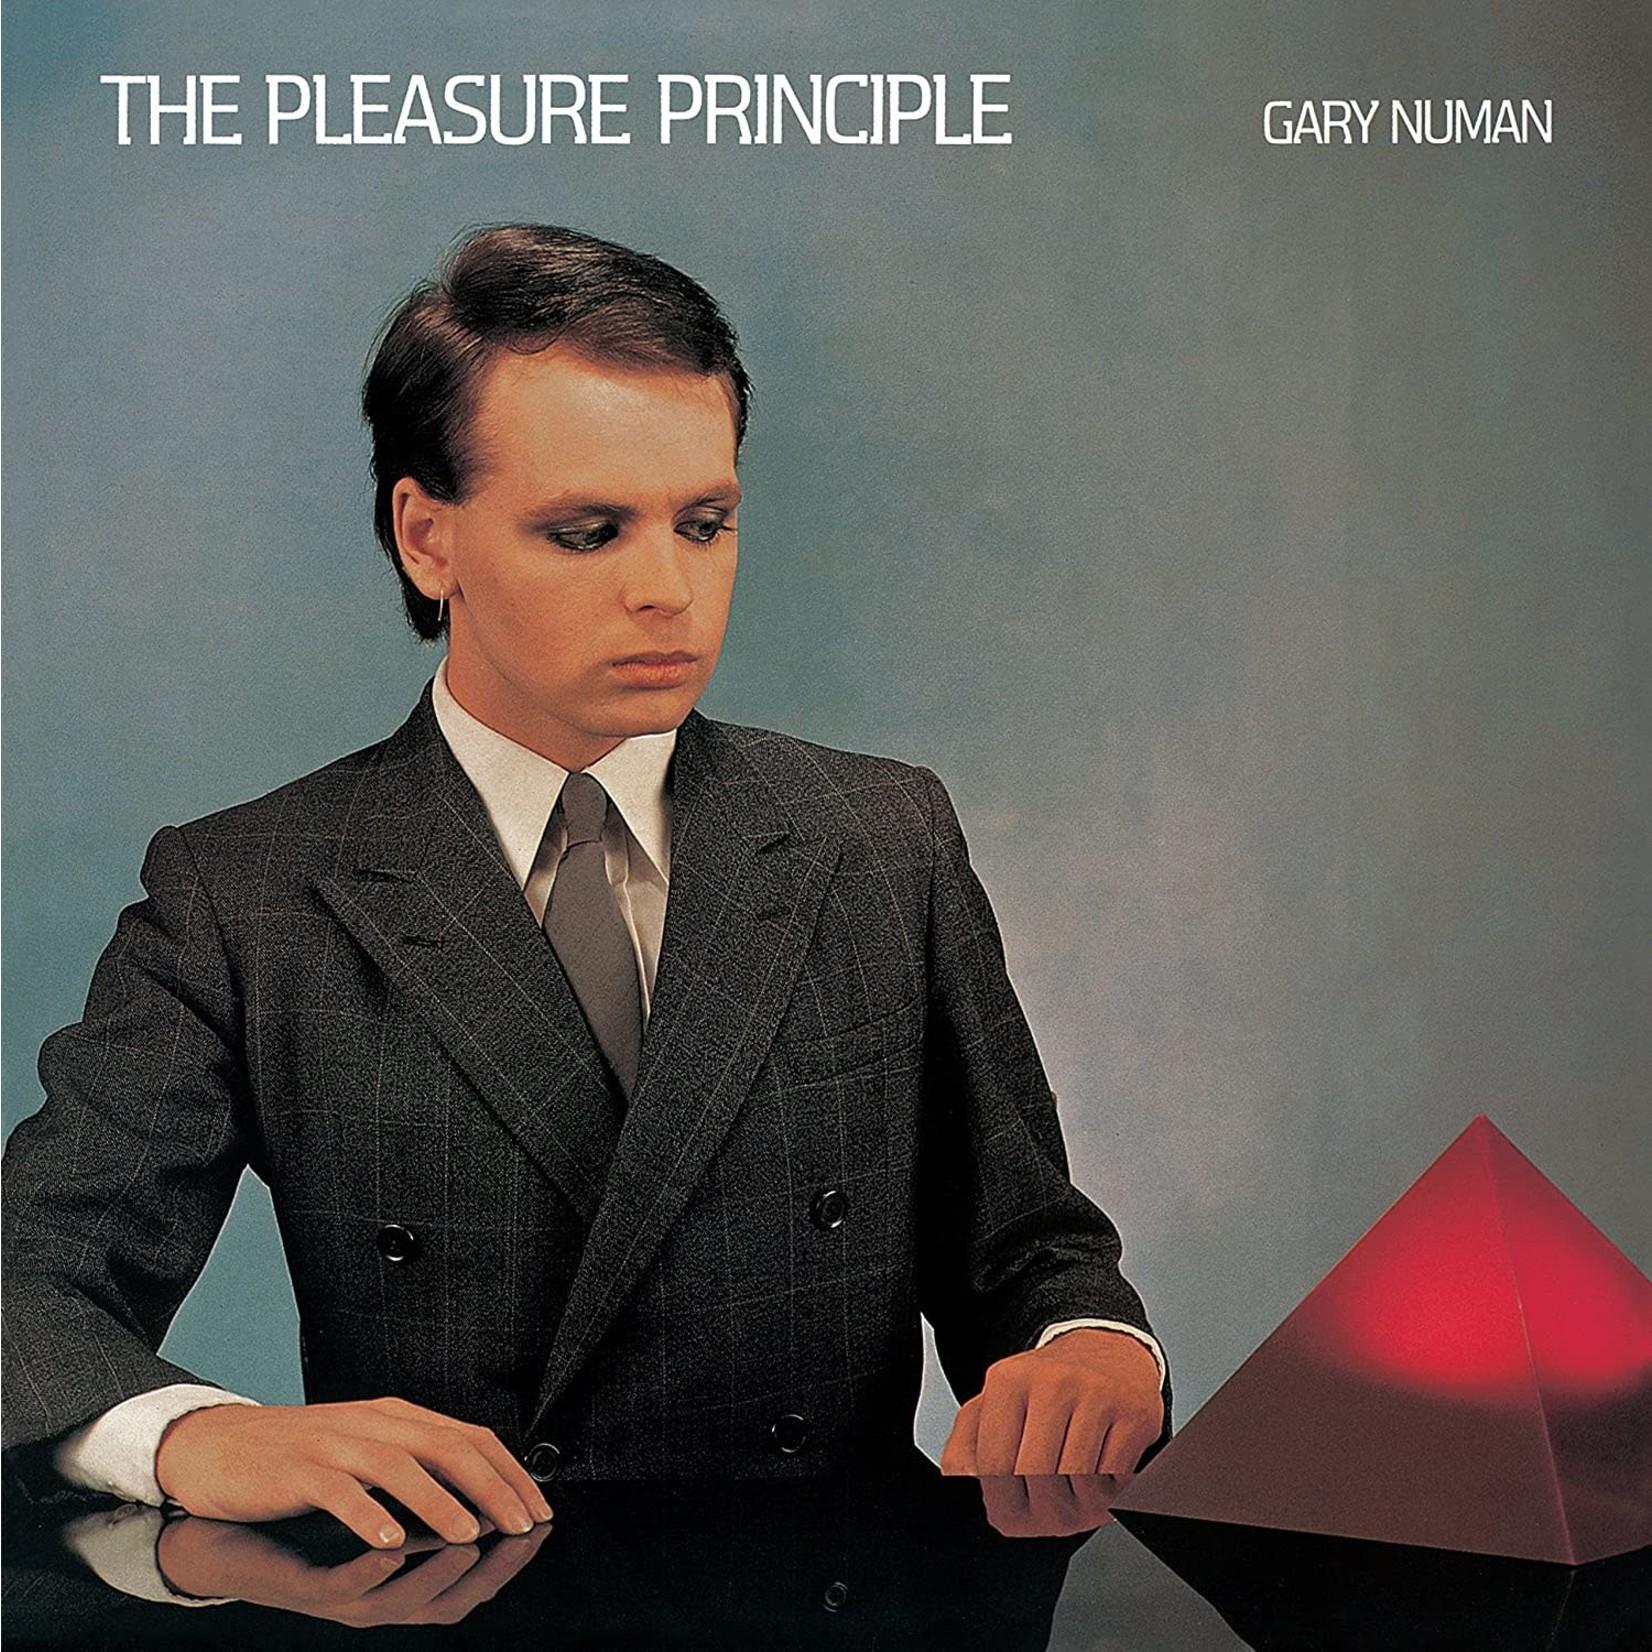 [New] Numan, Gary: The Pleasure Principle